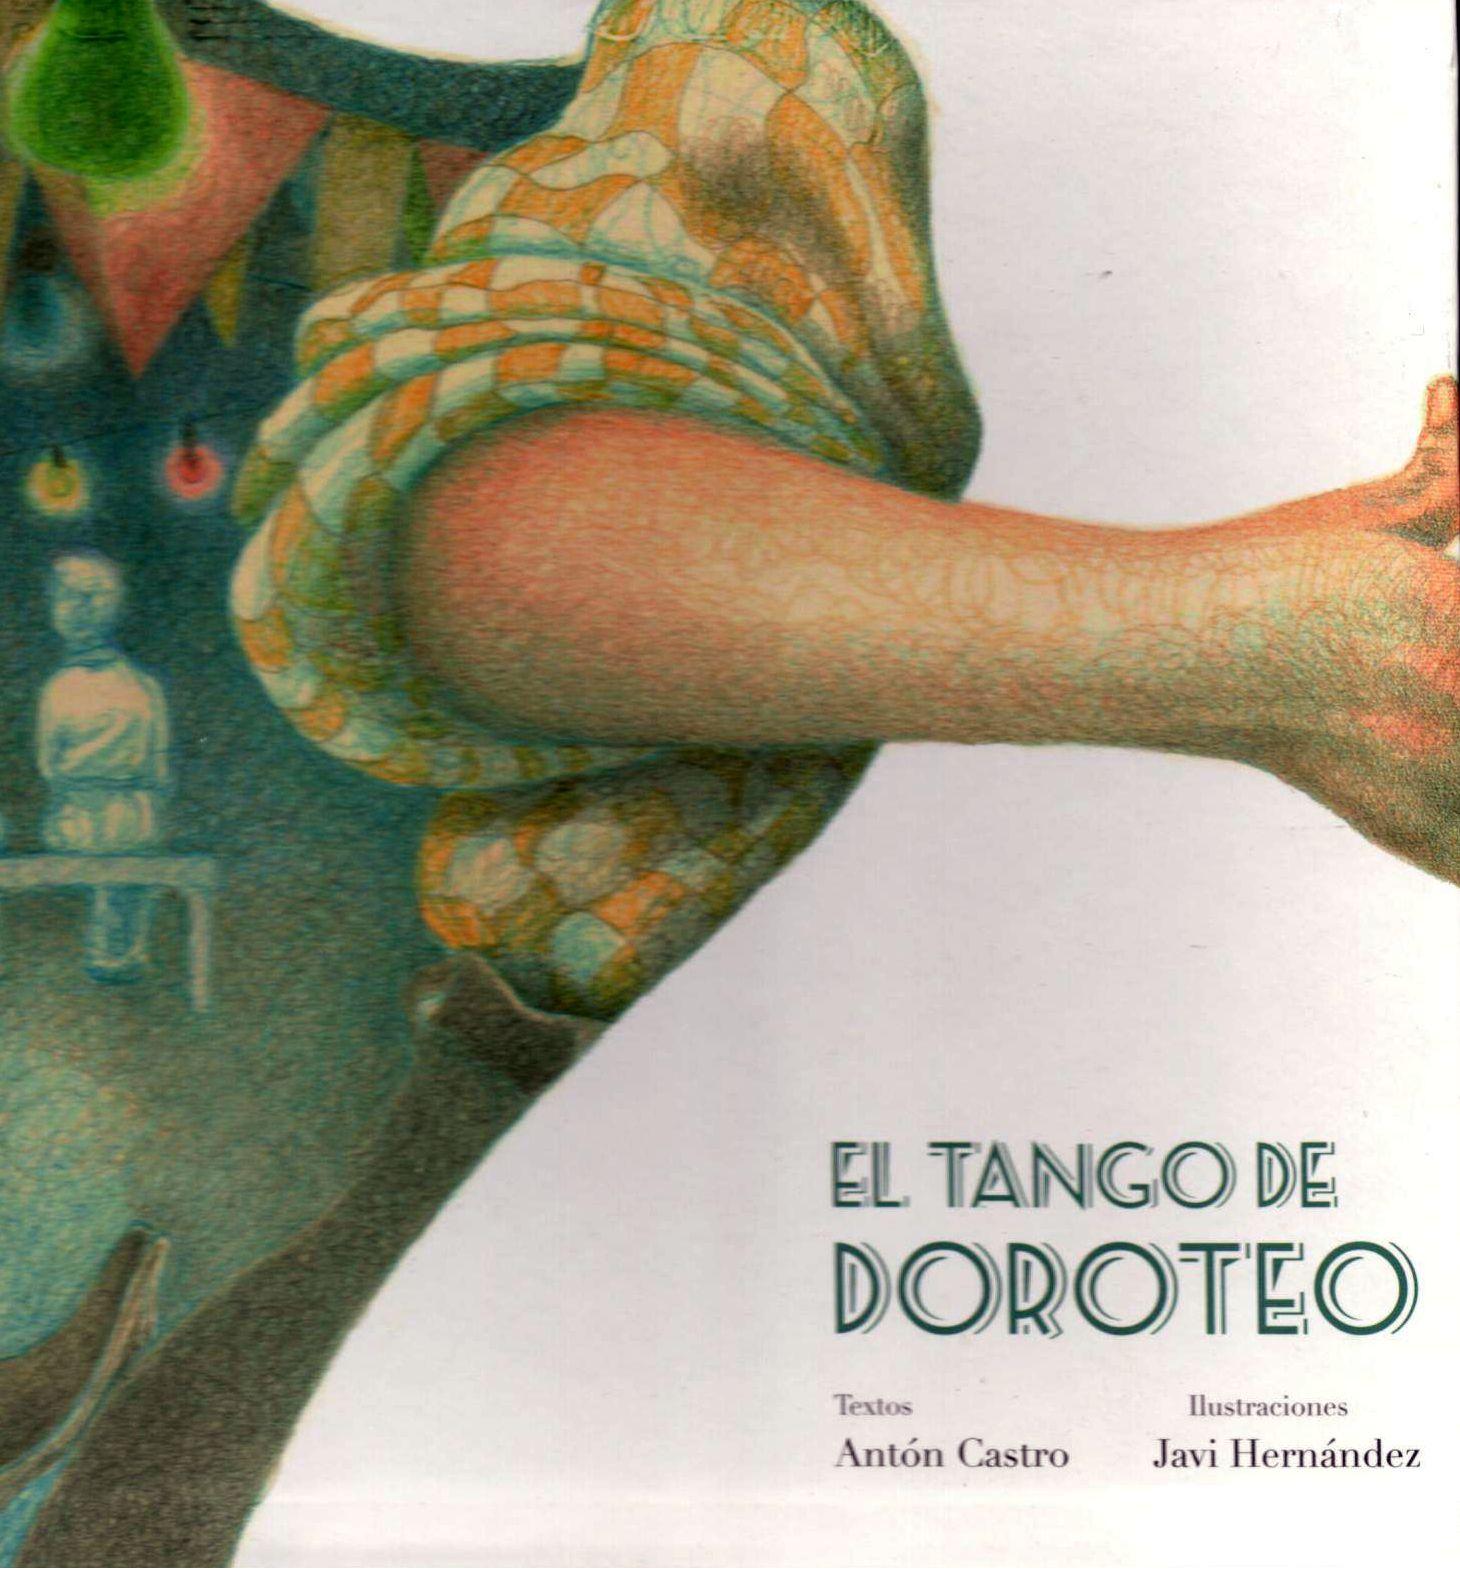 El tango de Doroteo